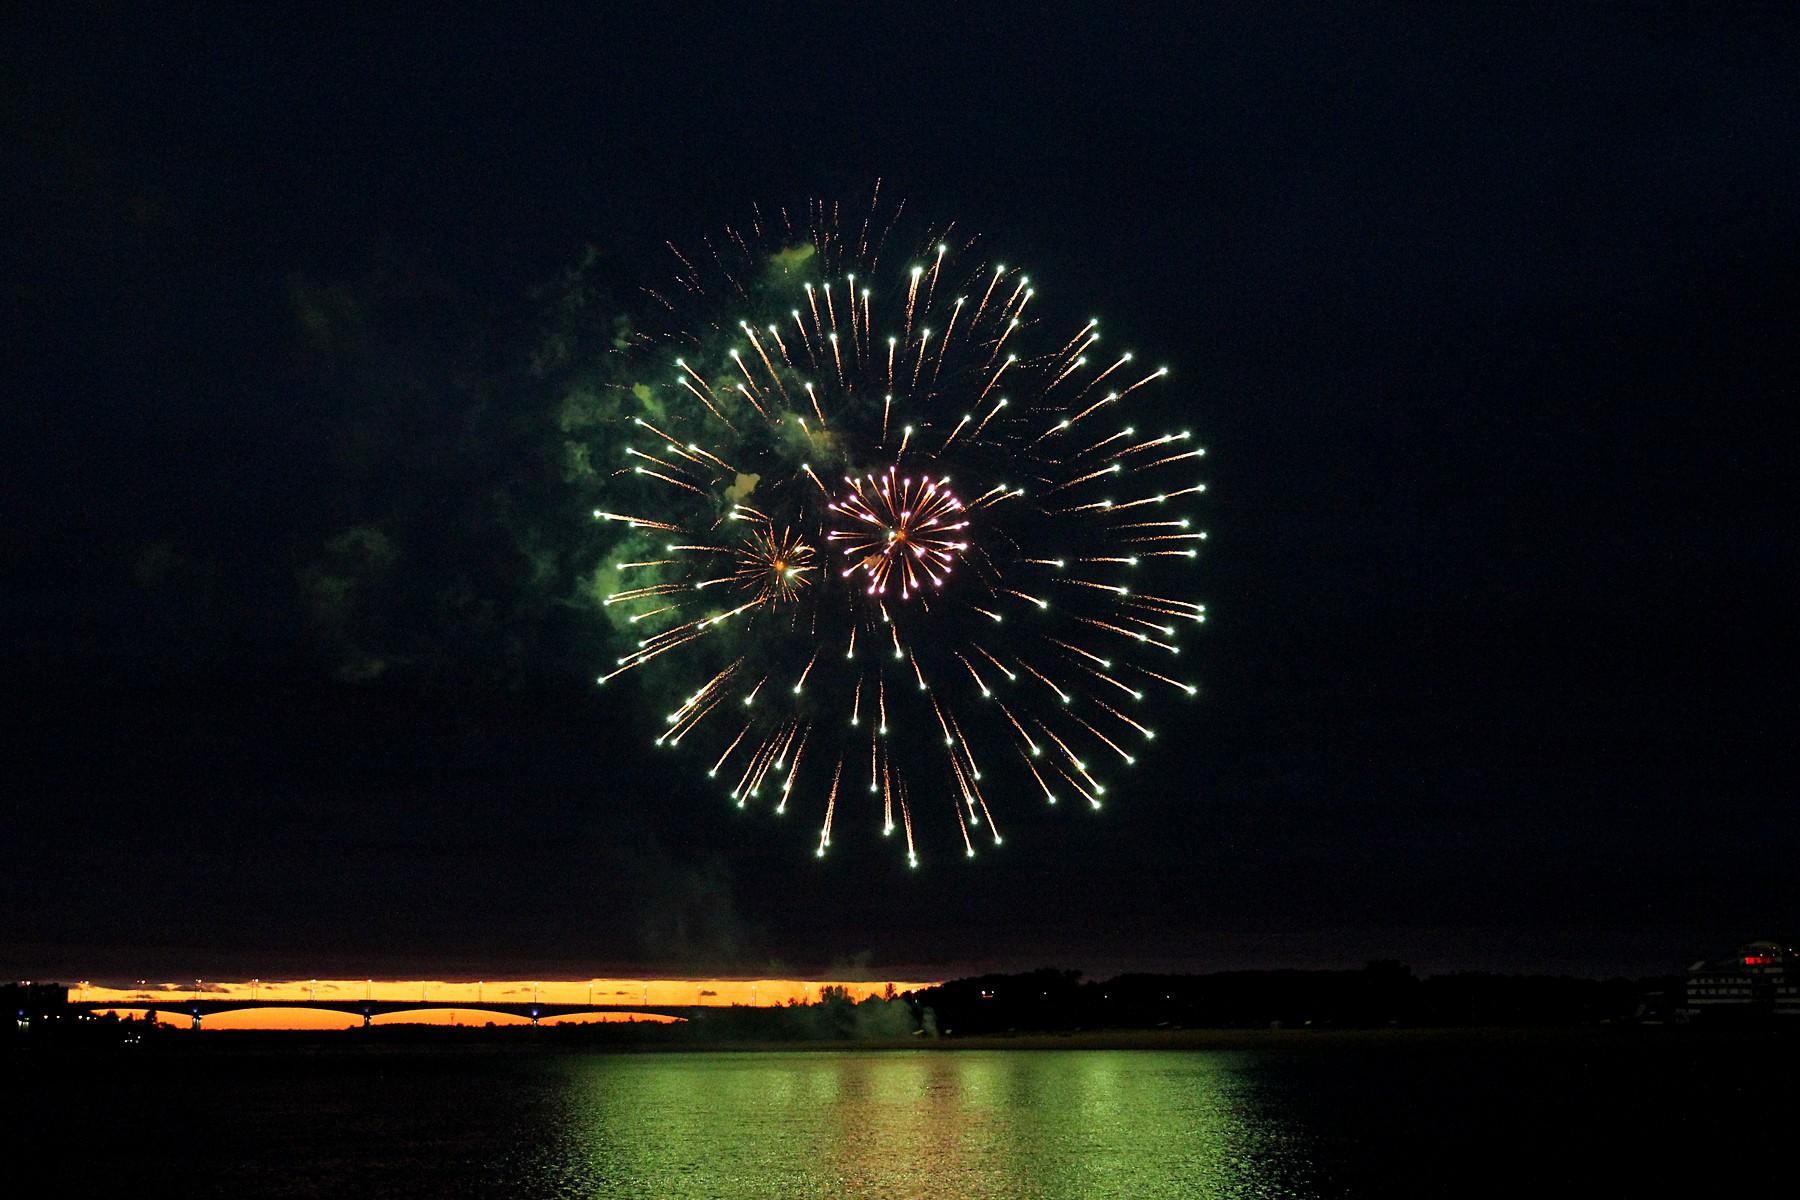 Фото с фестиваля фейерверков